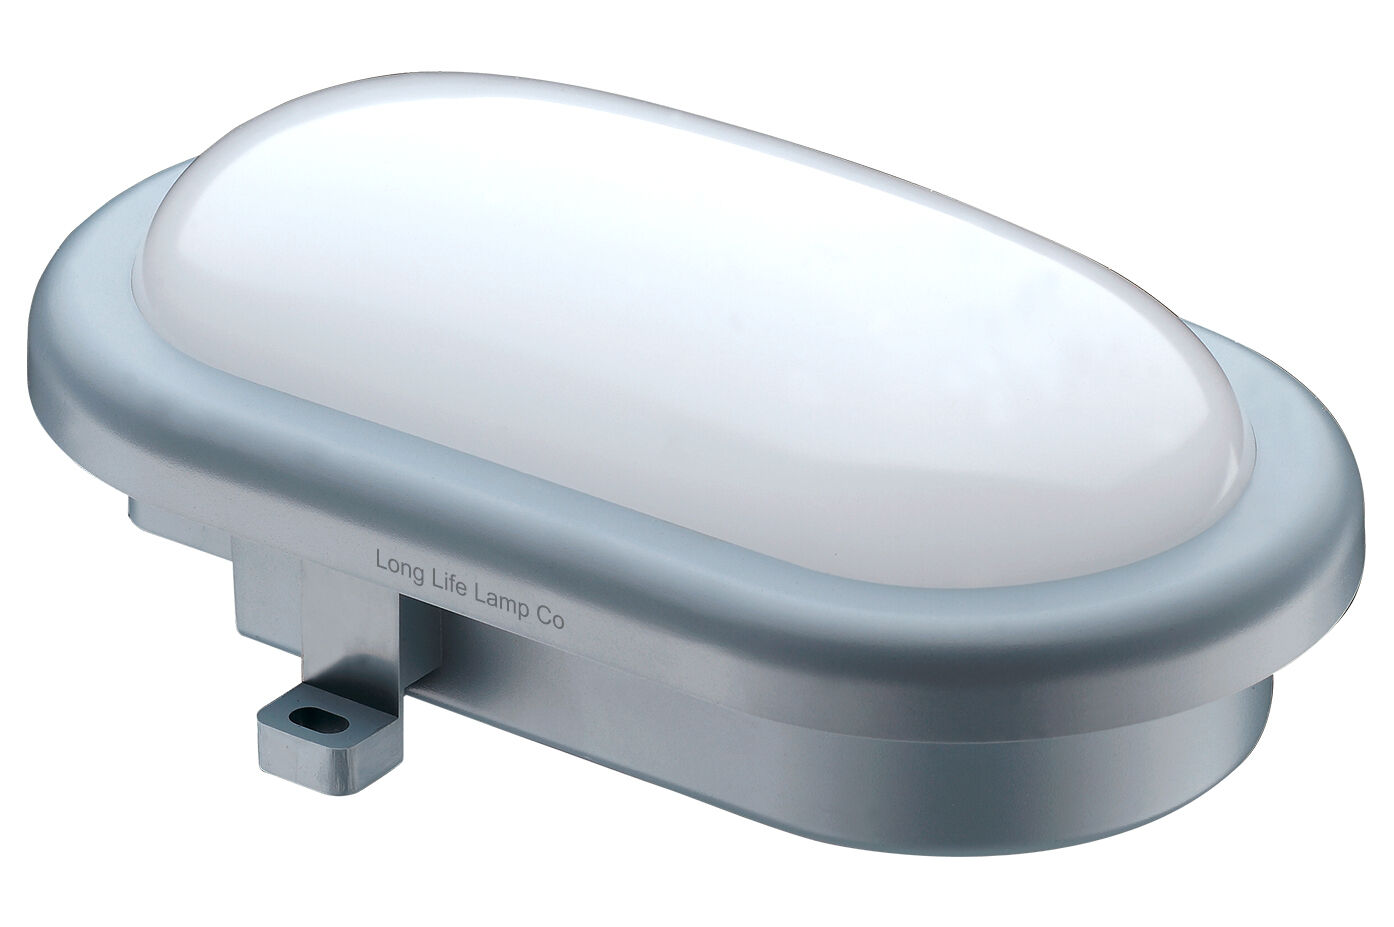 Domestic External Wall Lights : 10W LED BULKHEAD Light Outdoor Wall Light 6000K Commercial & Domestic Use eBay